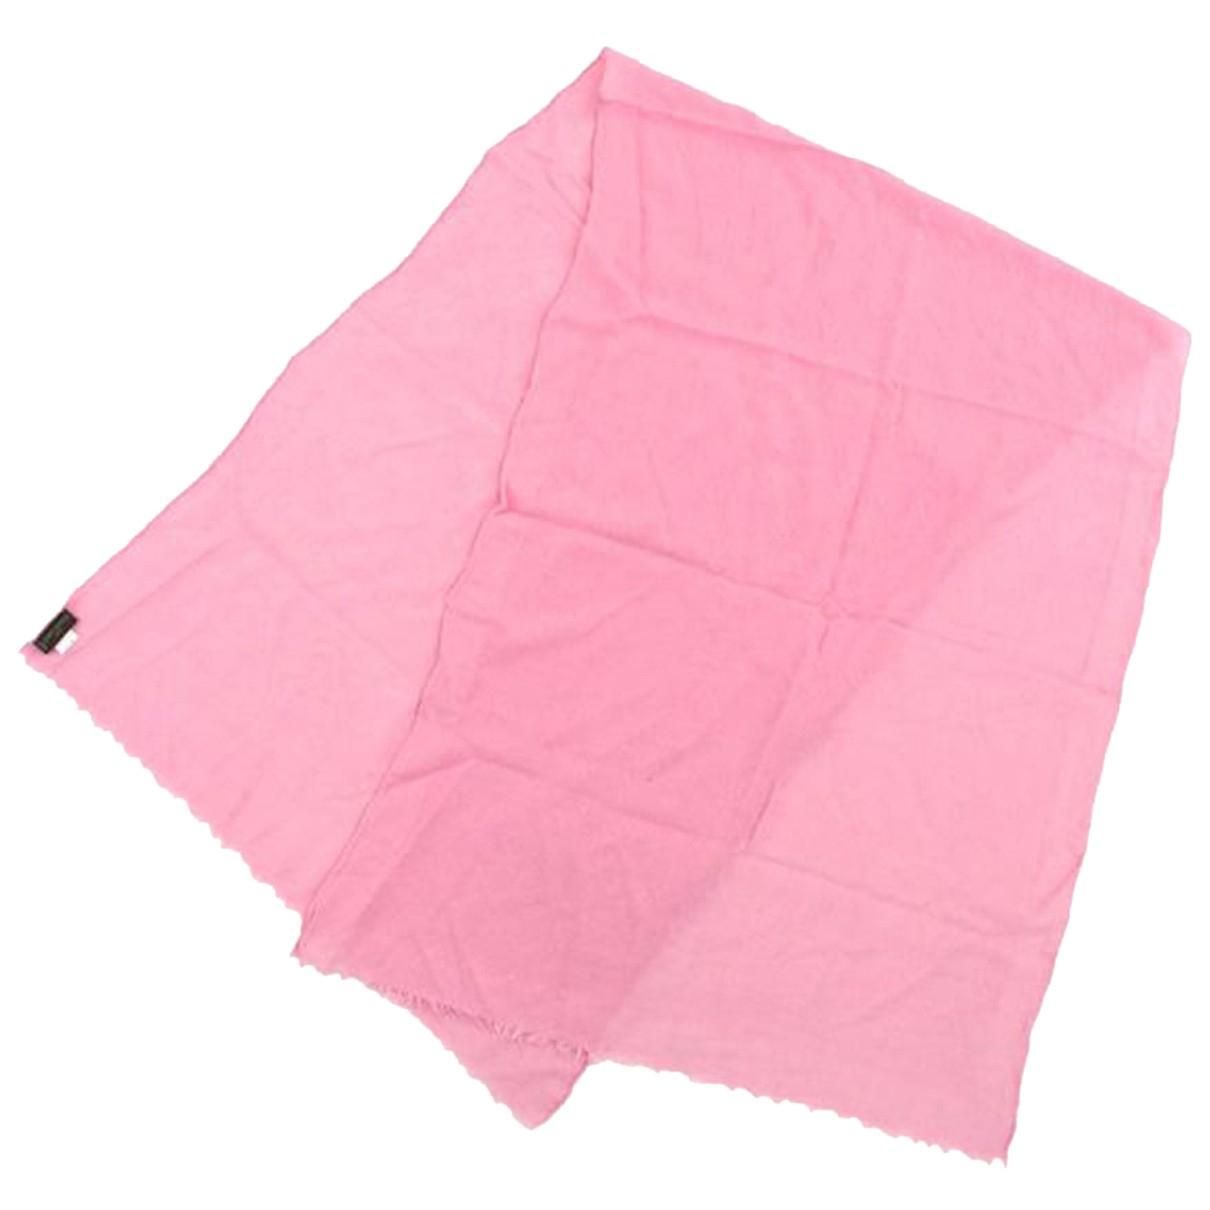 Louis Vuitton N Pink scarf for Women N